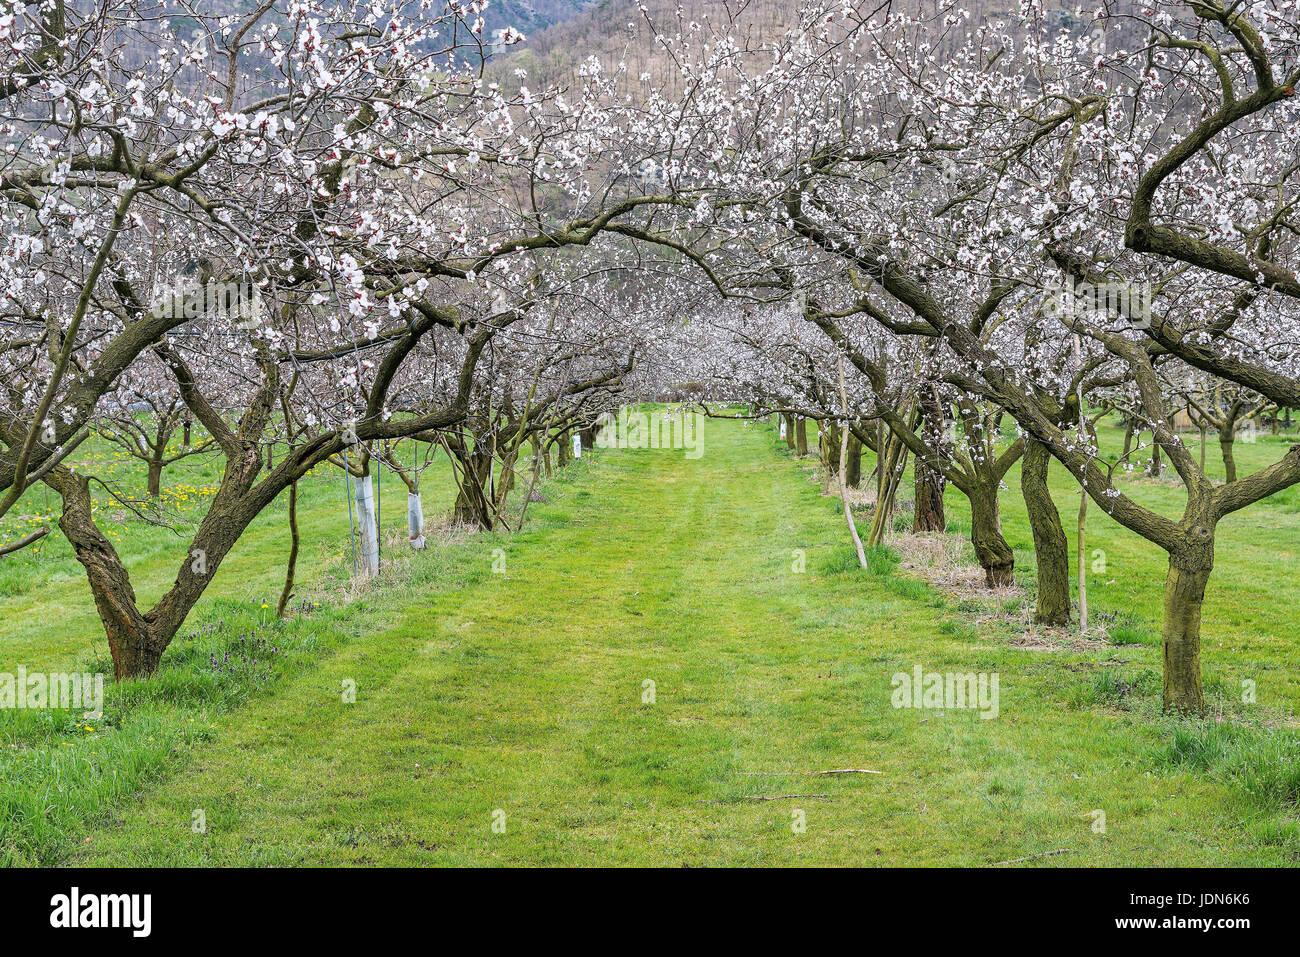 Marillenbaum (Prunus armeniaca) - Stock Image